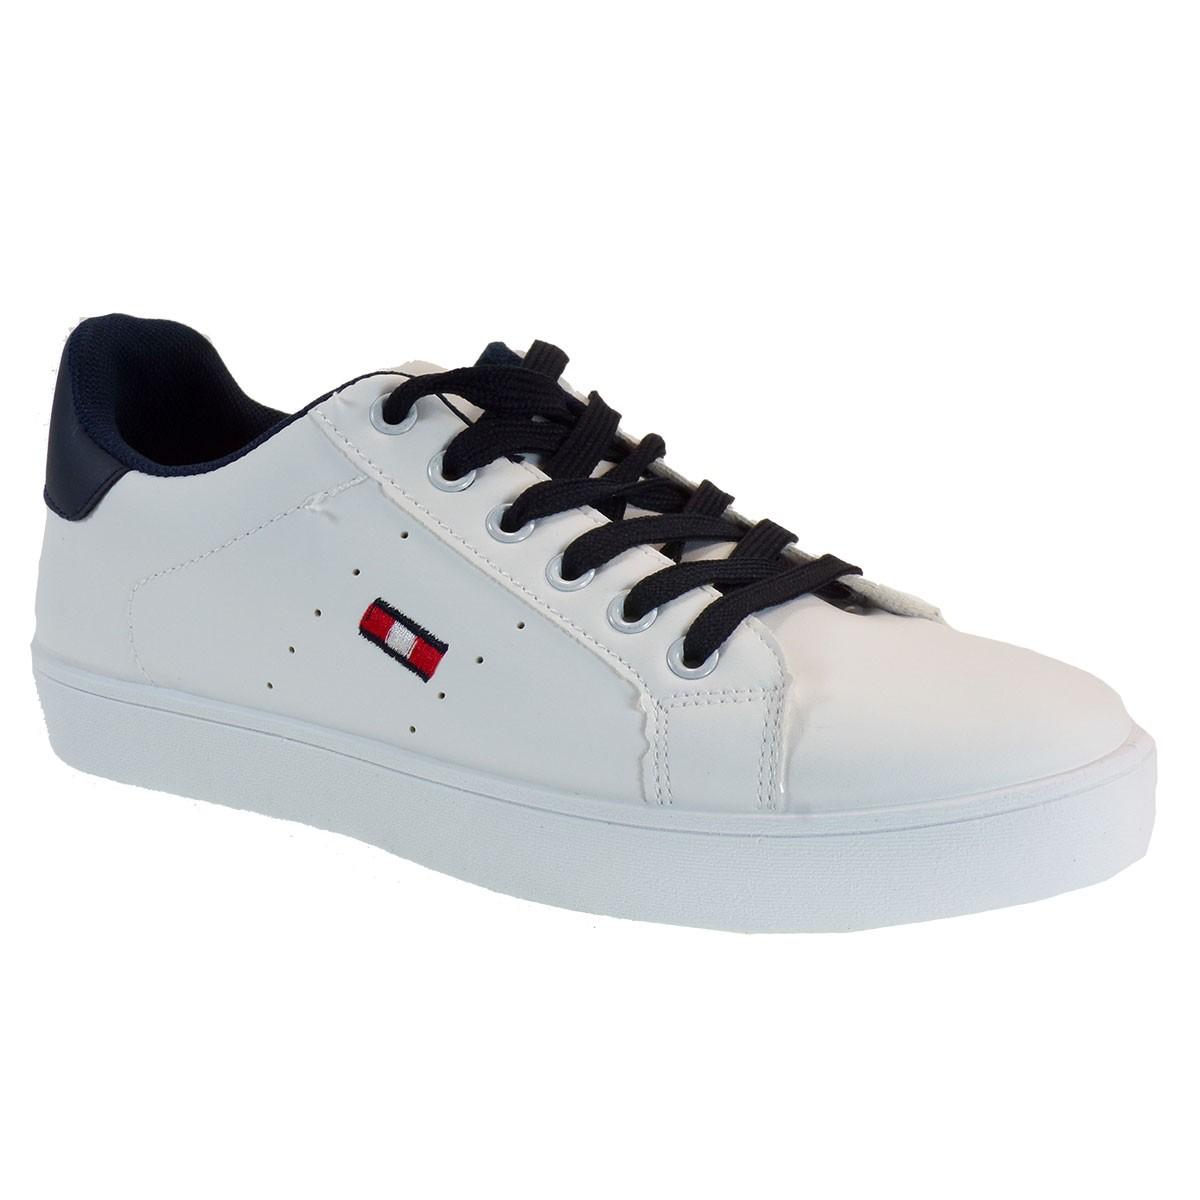 Bagiota Shoes Γυναικεία Παπούτσια Sneakers Αθλητικά Β159 Λευκό